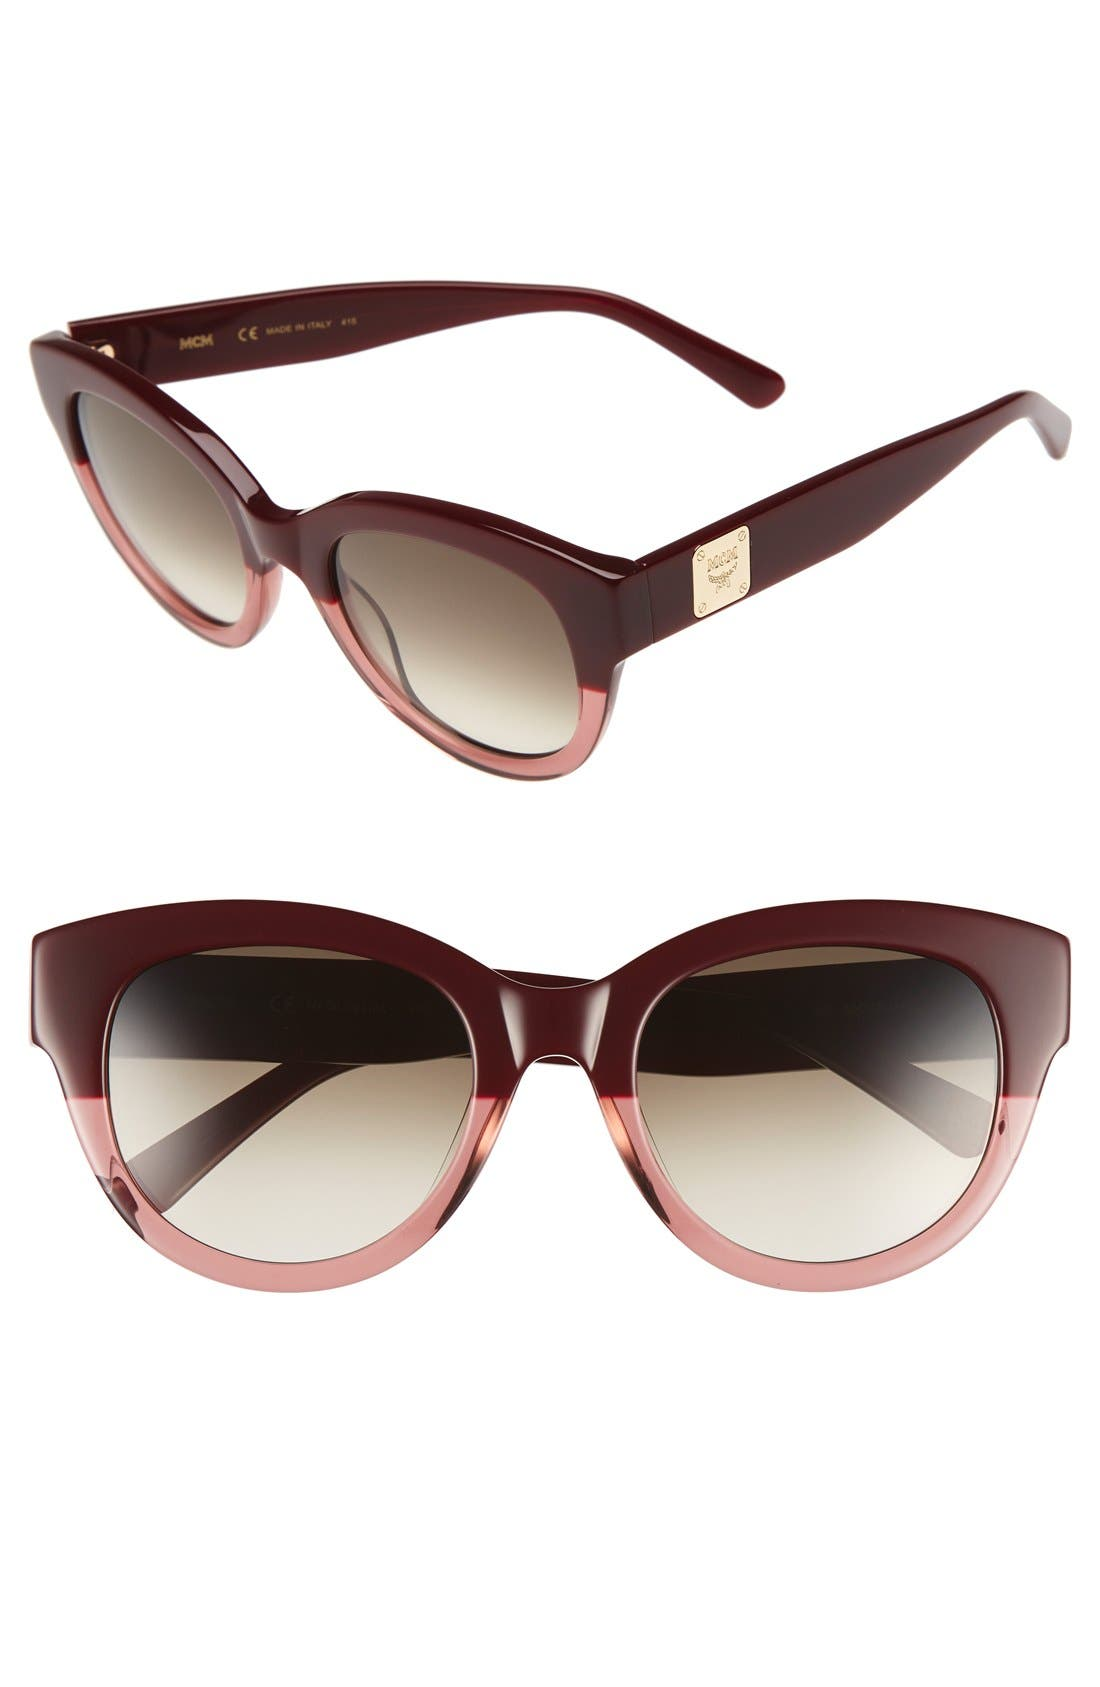 Main Image - MCM 53mm Cat Eye Sunglasses